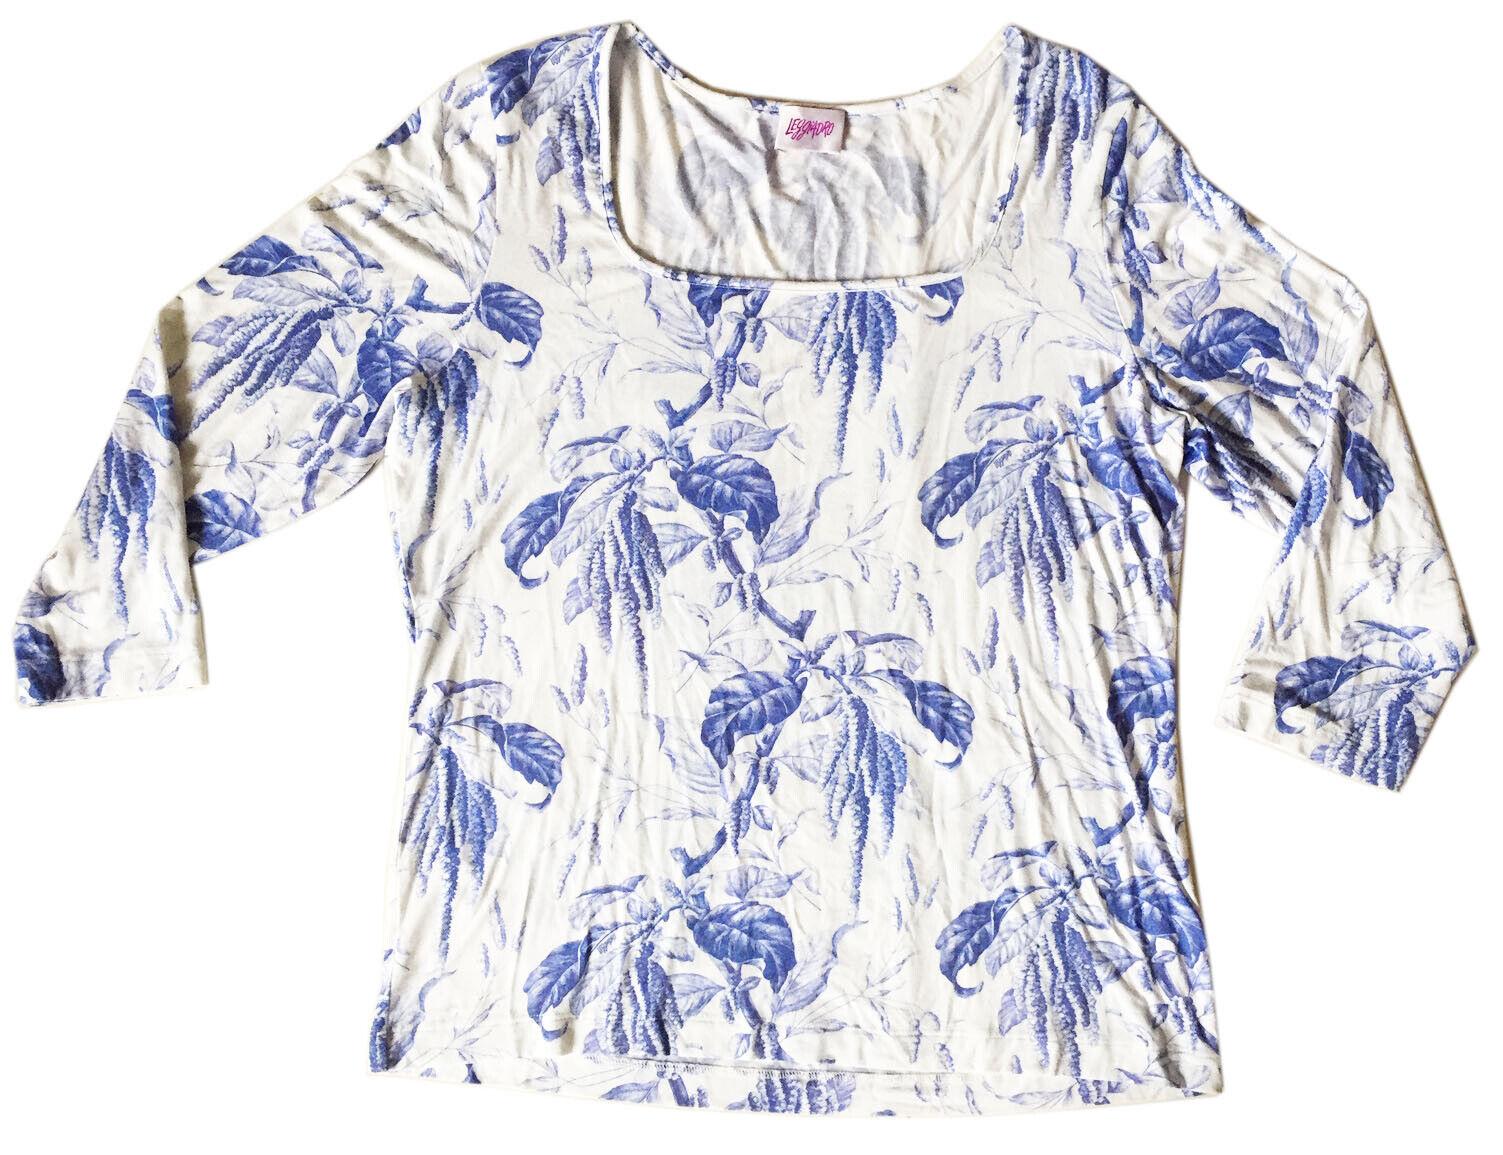 LEGGIADRO Tee Stretch Viscose 3 4 Sleeve Blau Weiß Botanical Print Sz 4 (12-14)